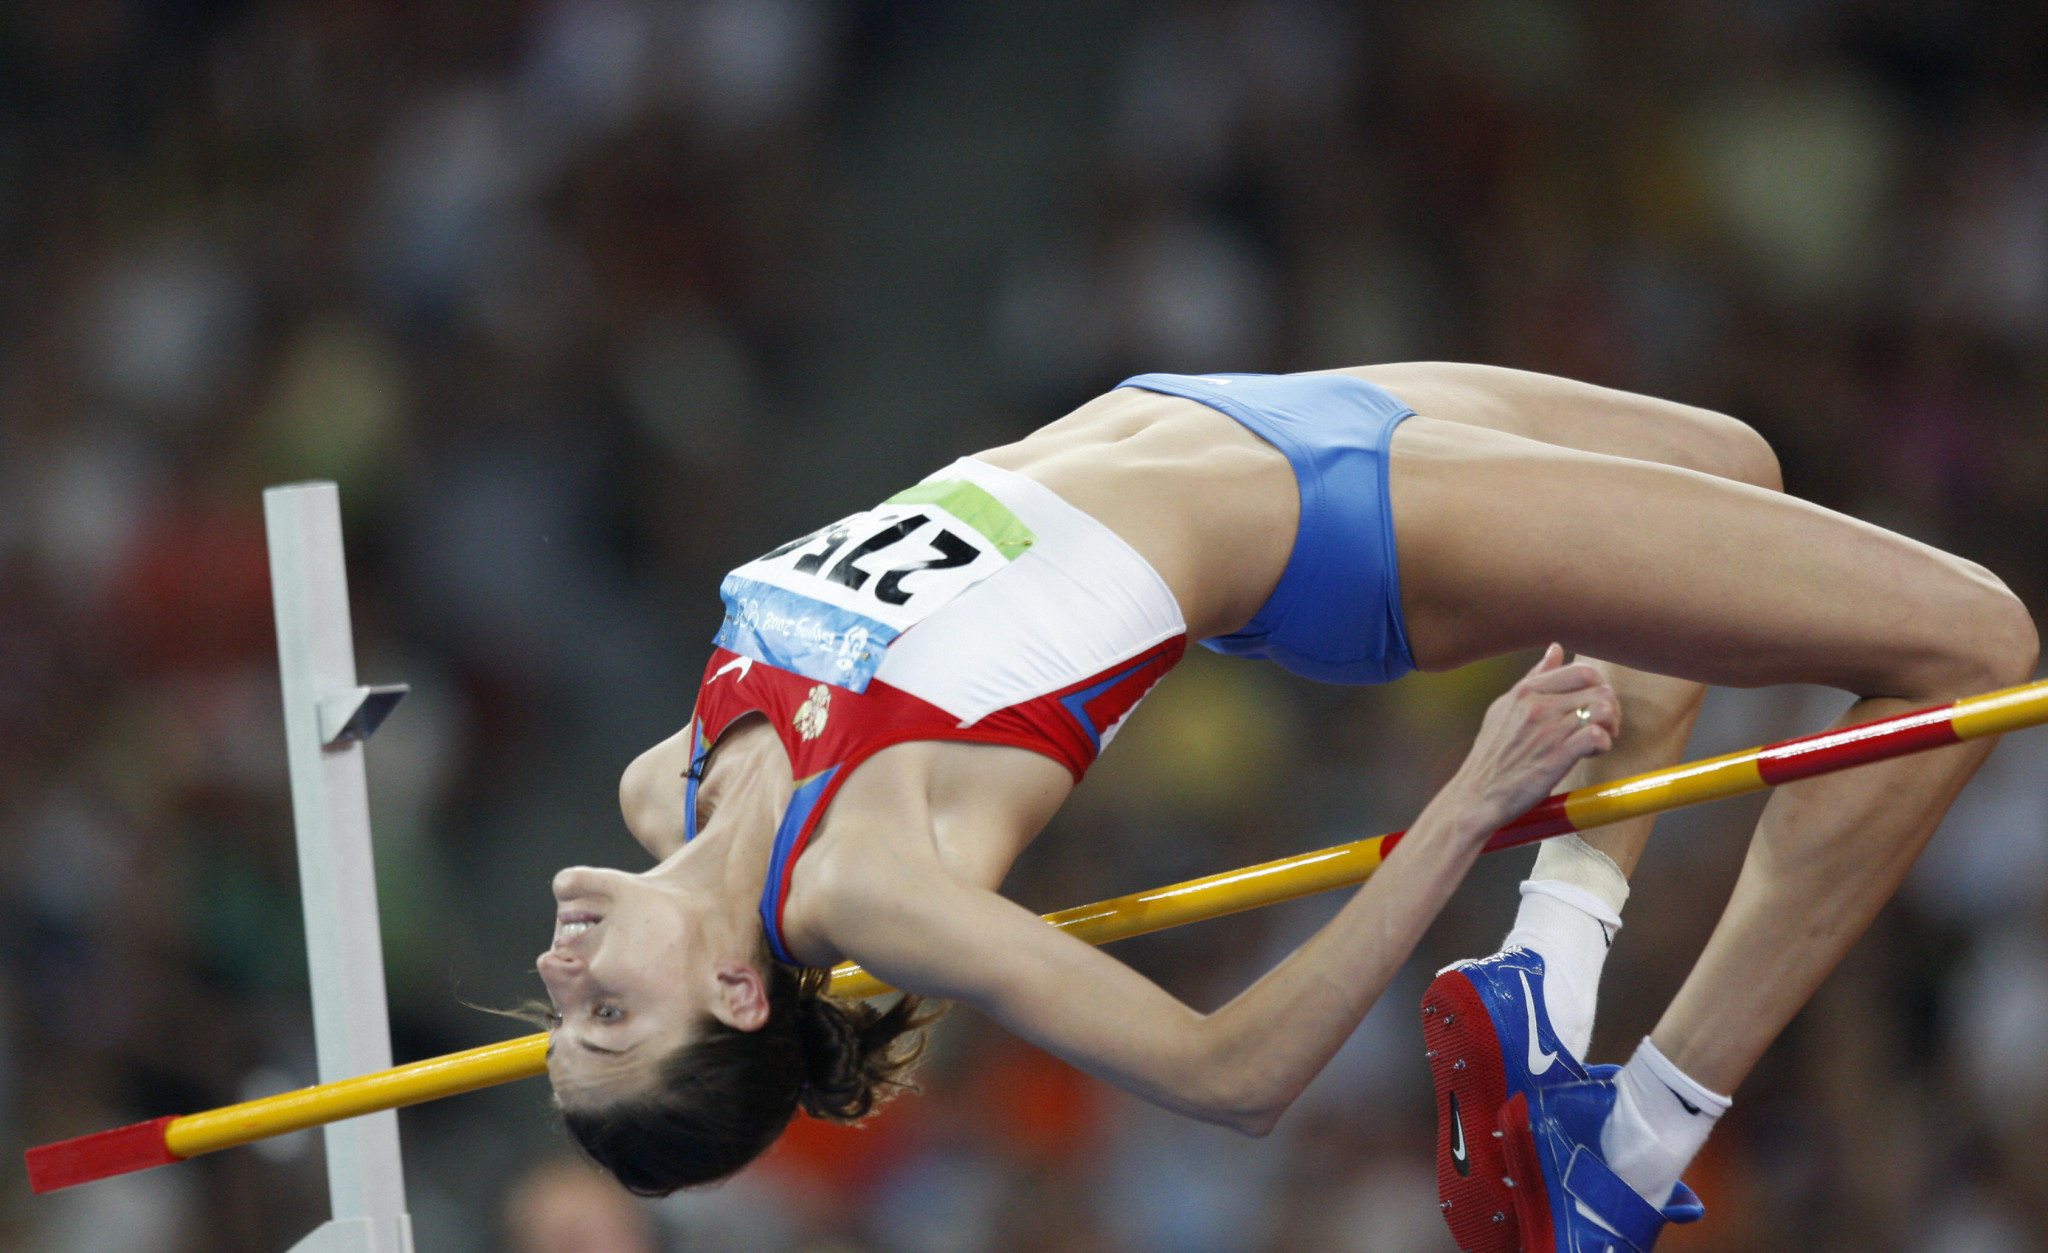 Anna Chicherova has been stripped of her Beijing 2008 bronze medals ©Getty Images